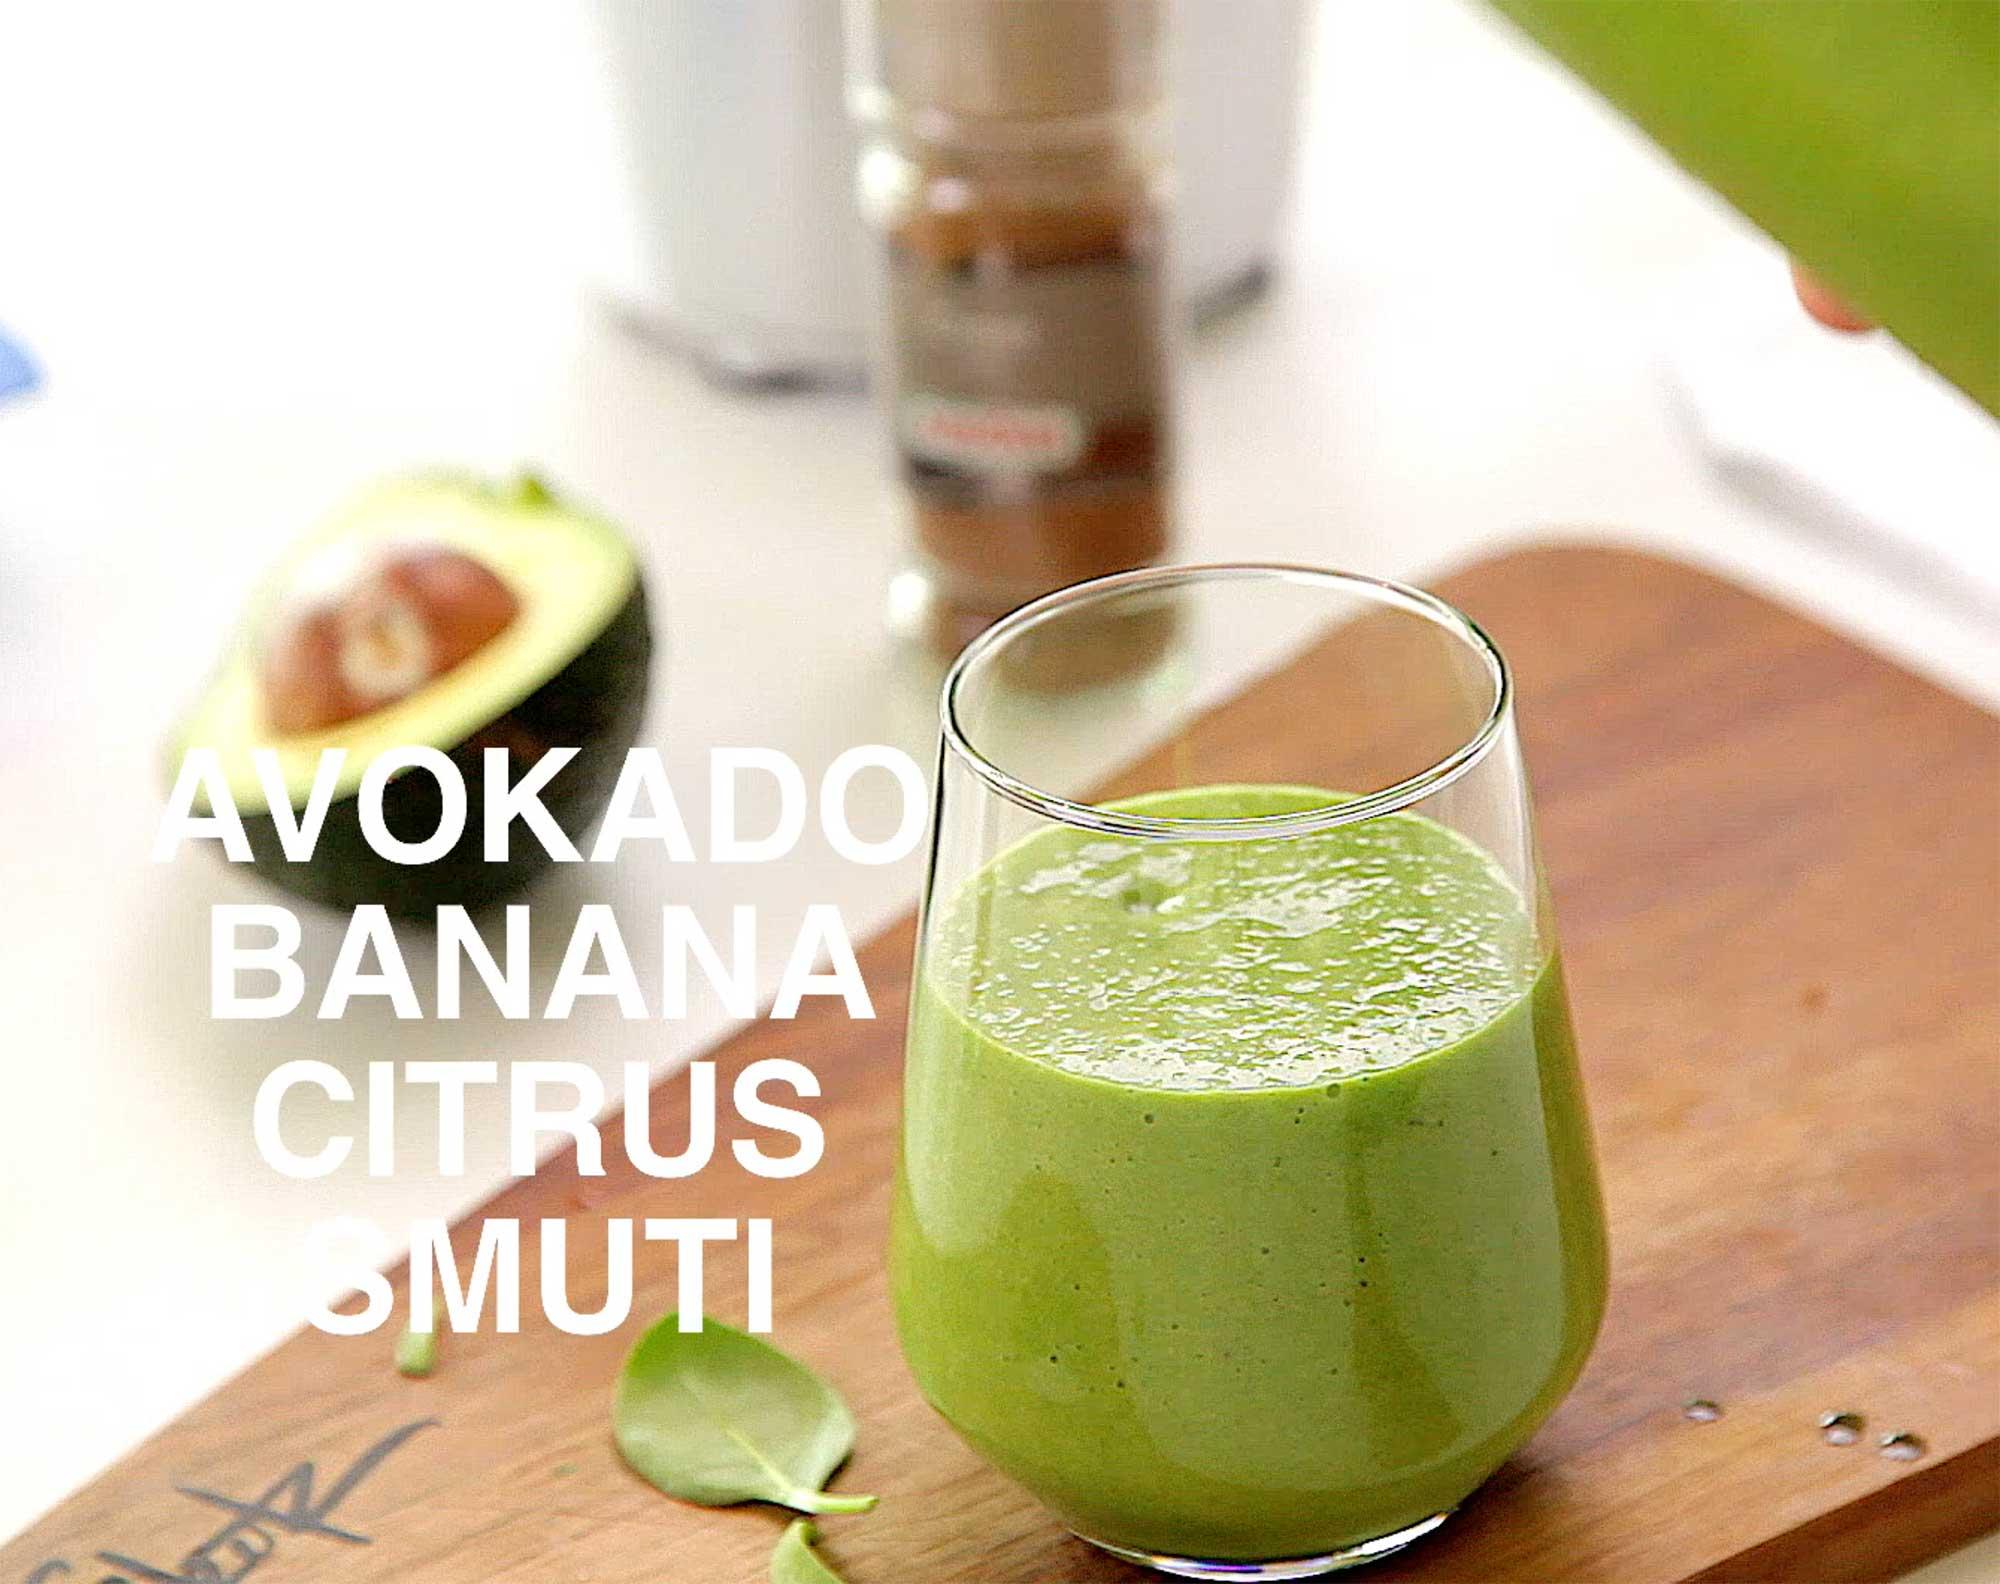 Smuti avokado banana špinača ingver cimet